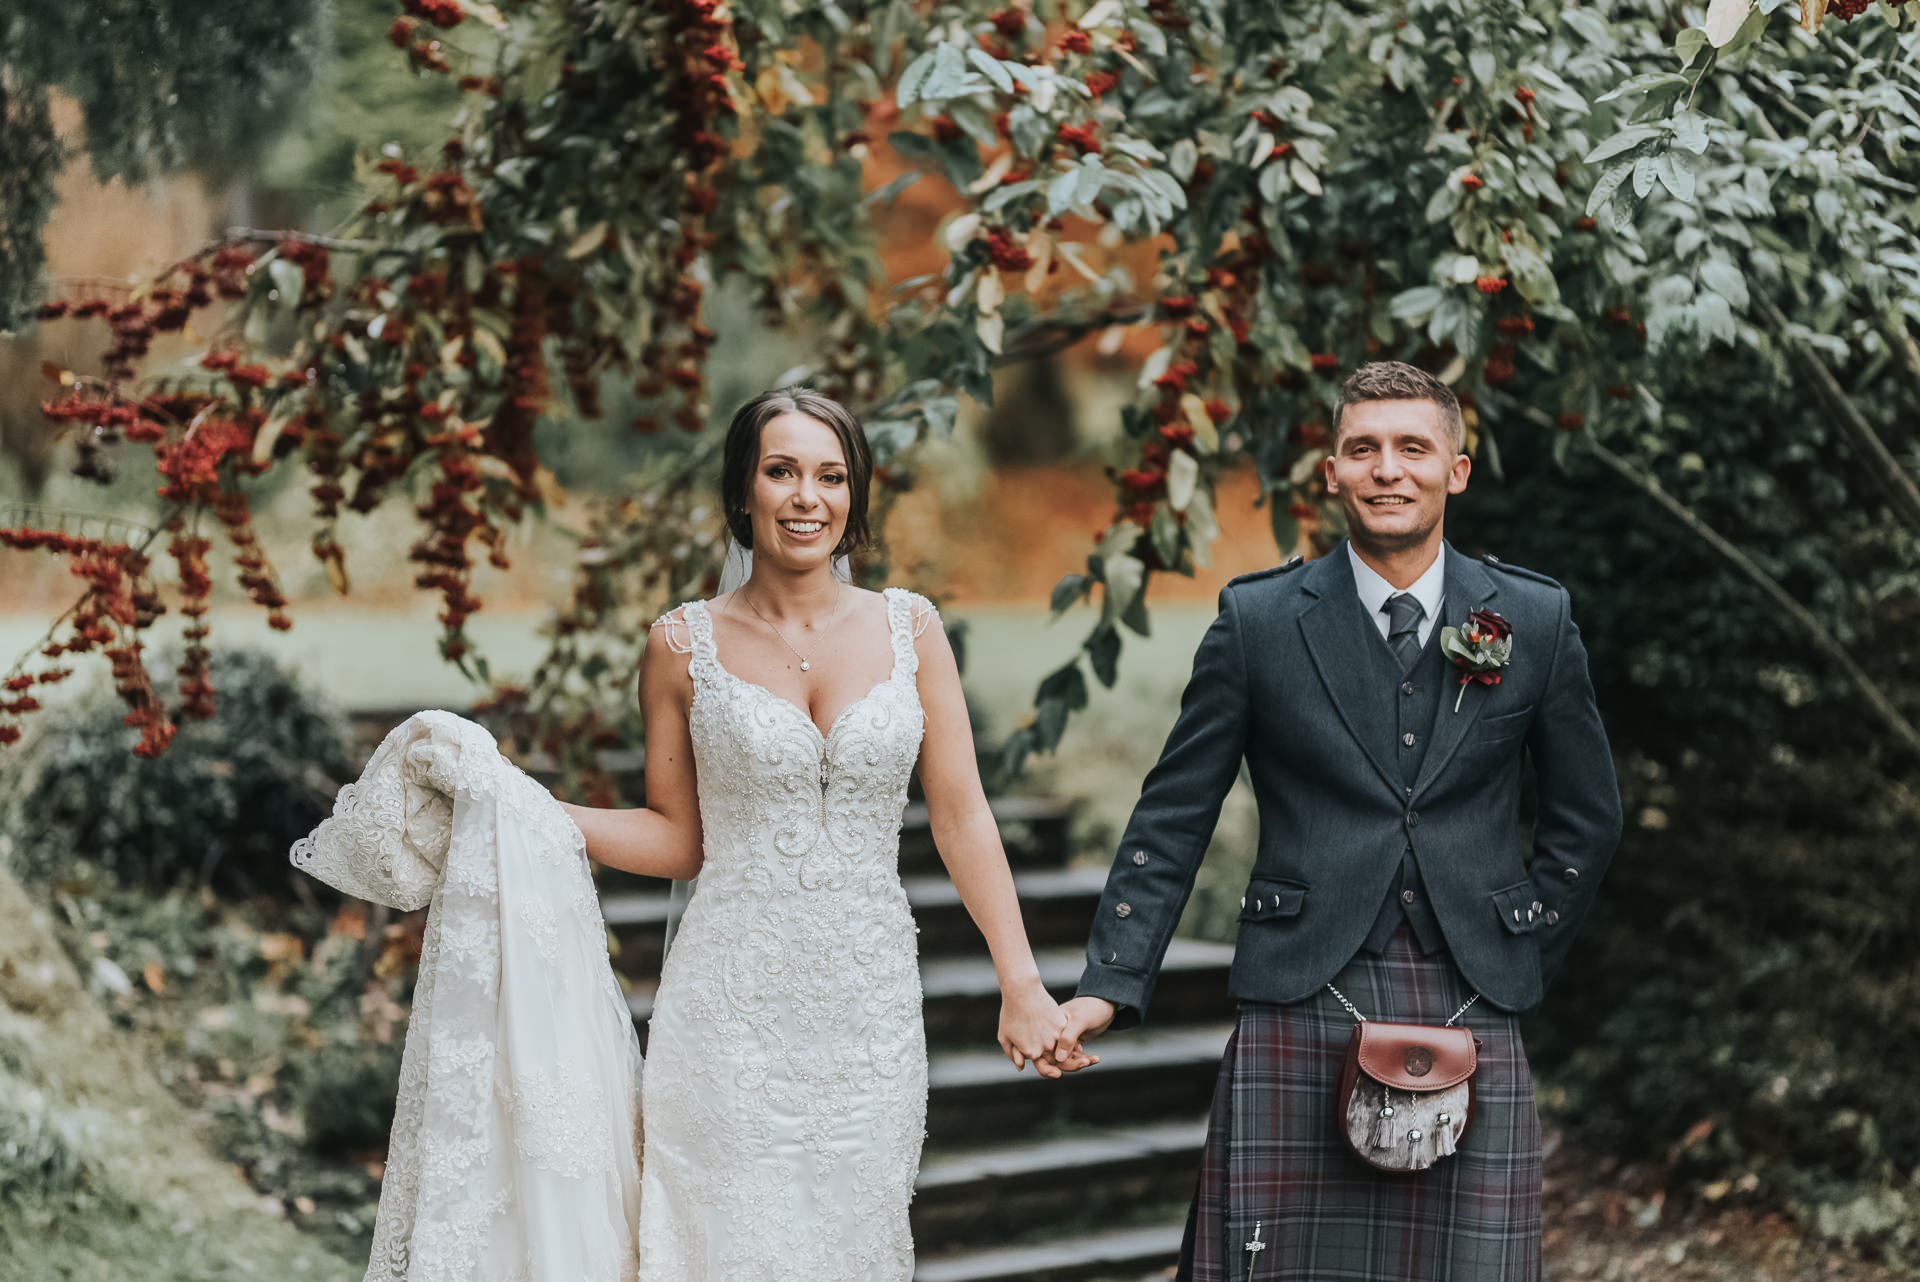 Balbirnie House wedding photos, weddings Balbirnie House, wedding photographer Edinburgh, wedding photographer Scotland, wedding photographer Glasgow, Karol Makula Photography, wedding photography Scotland, Scotland wedding photographer